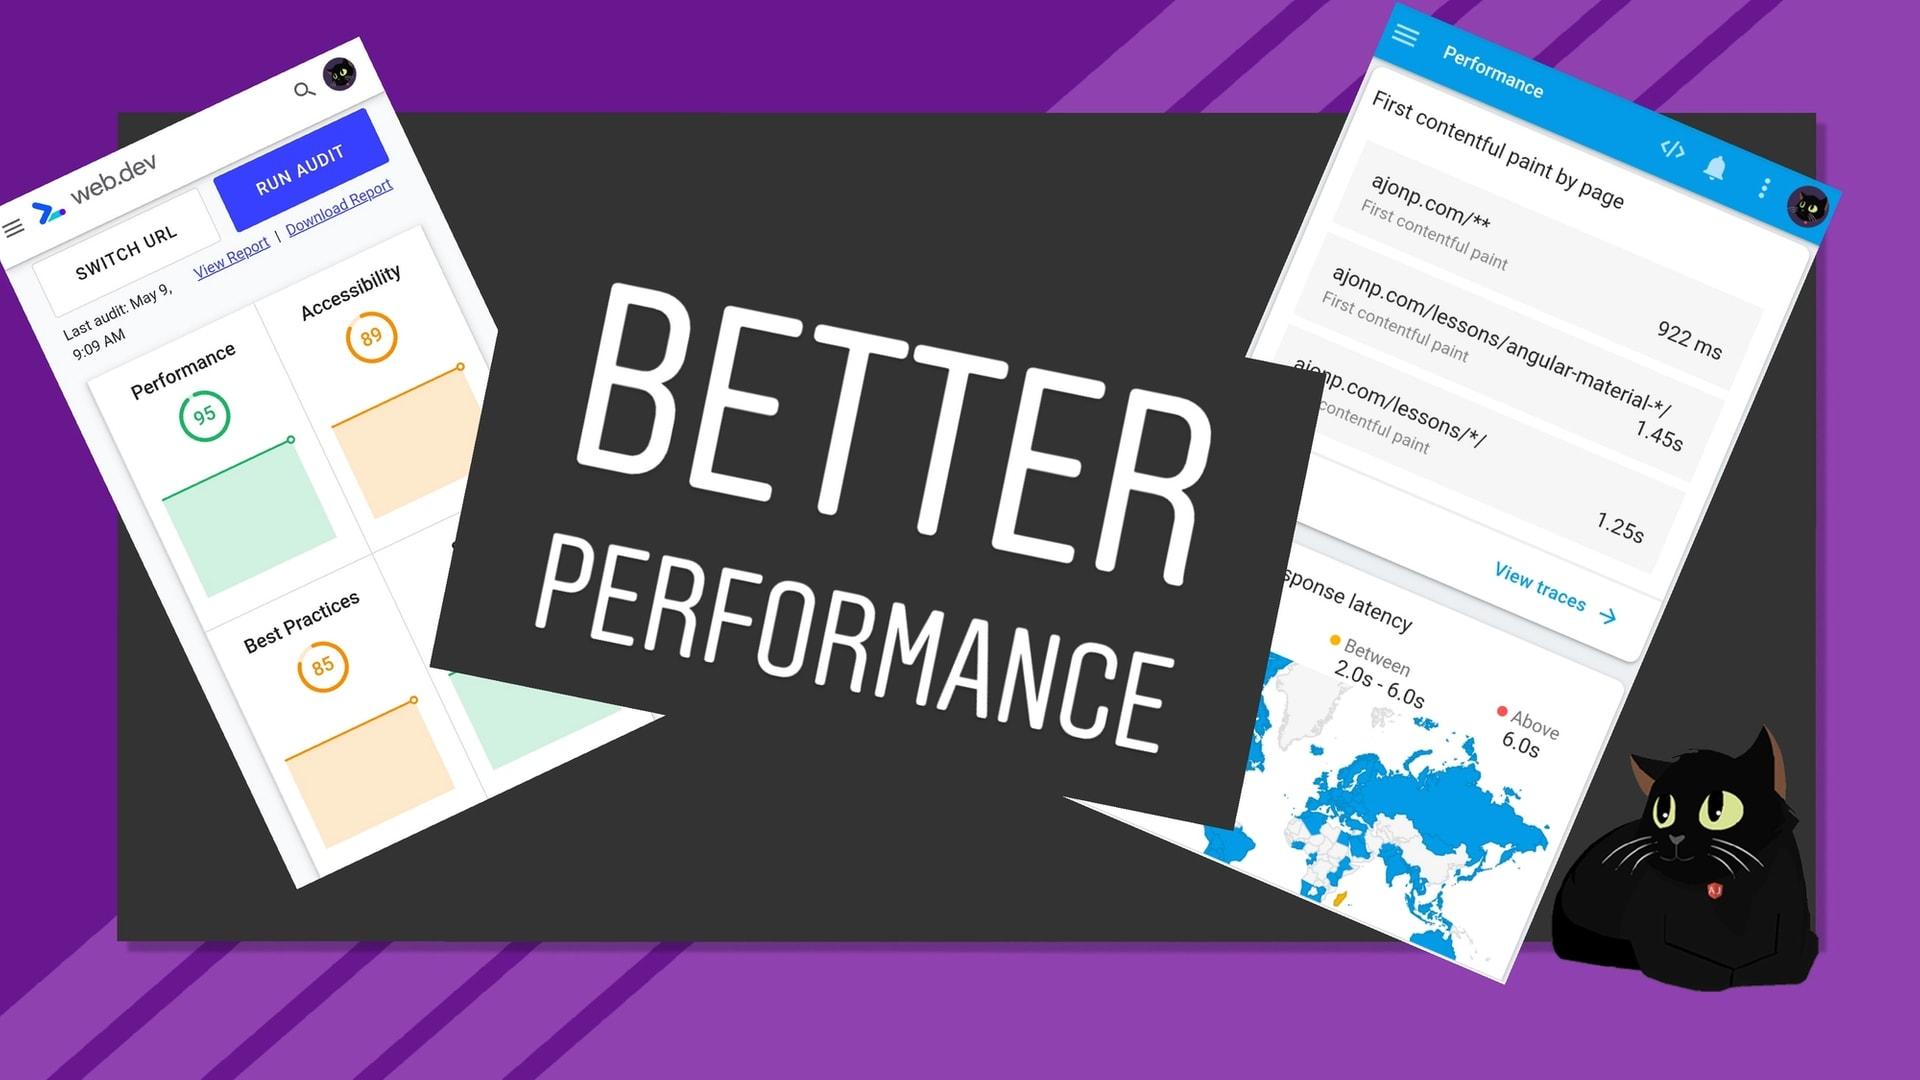 Better Performance through analysis